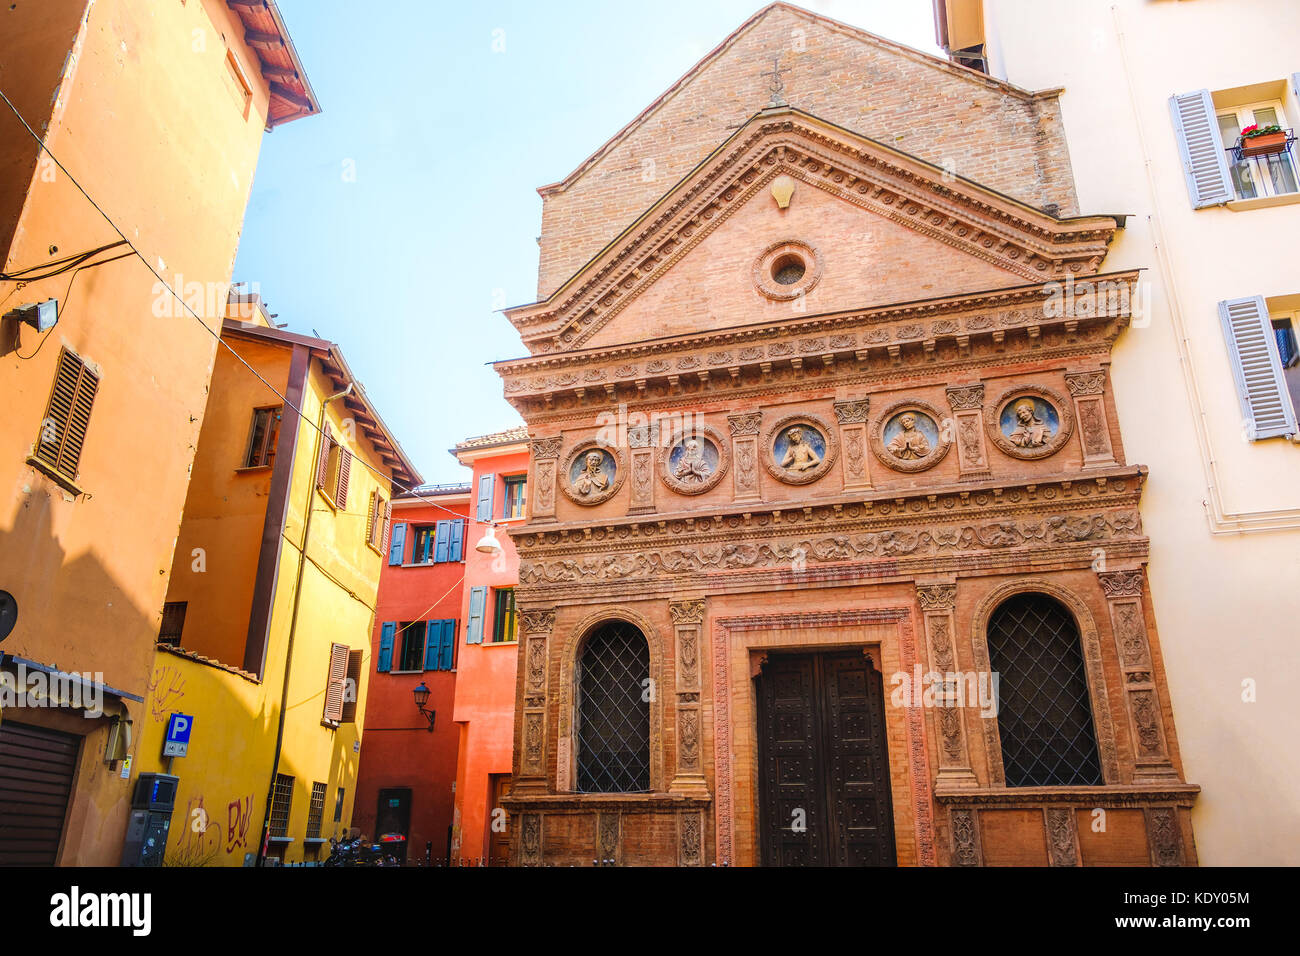 Oratorio Santo Spirito Bologna - Emilia Romagna church - Italy - Stock Image